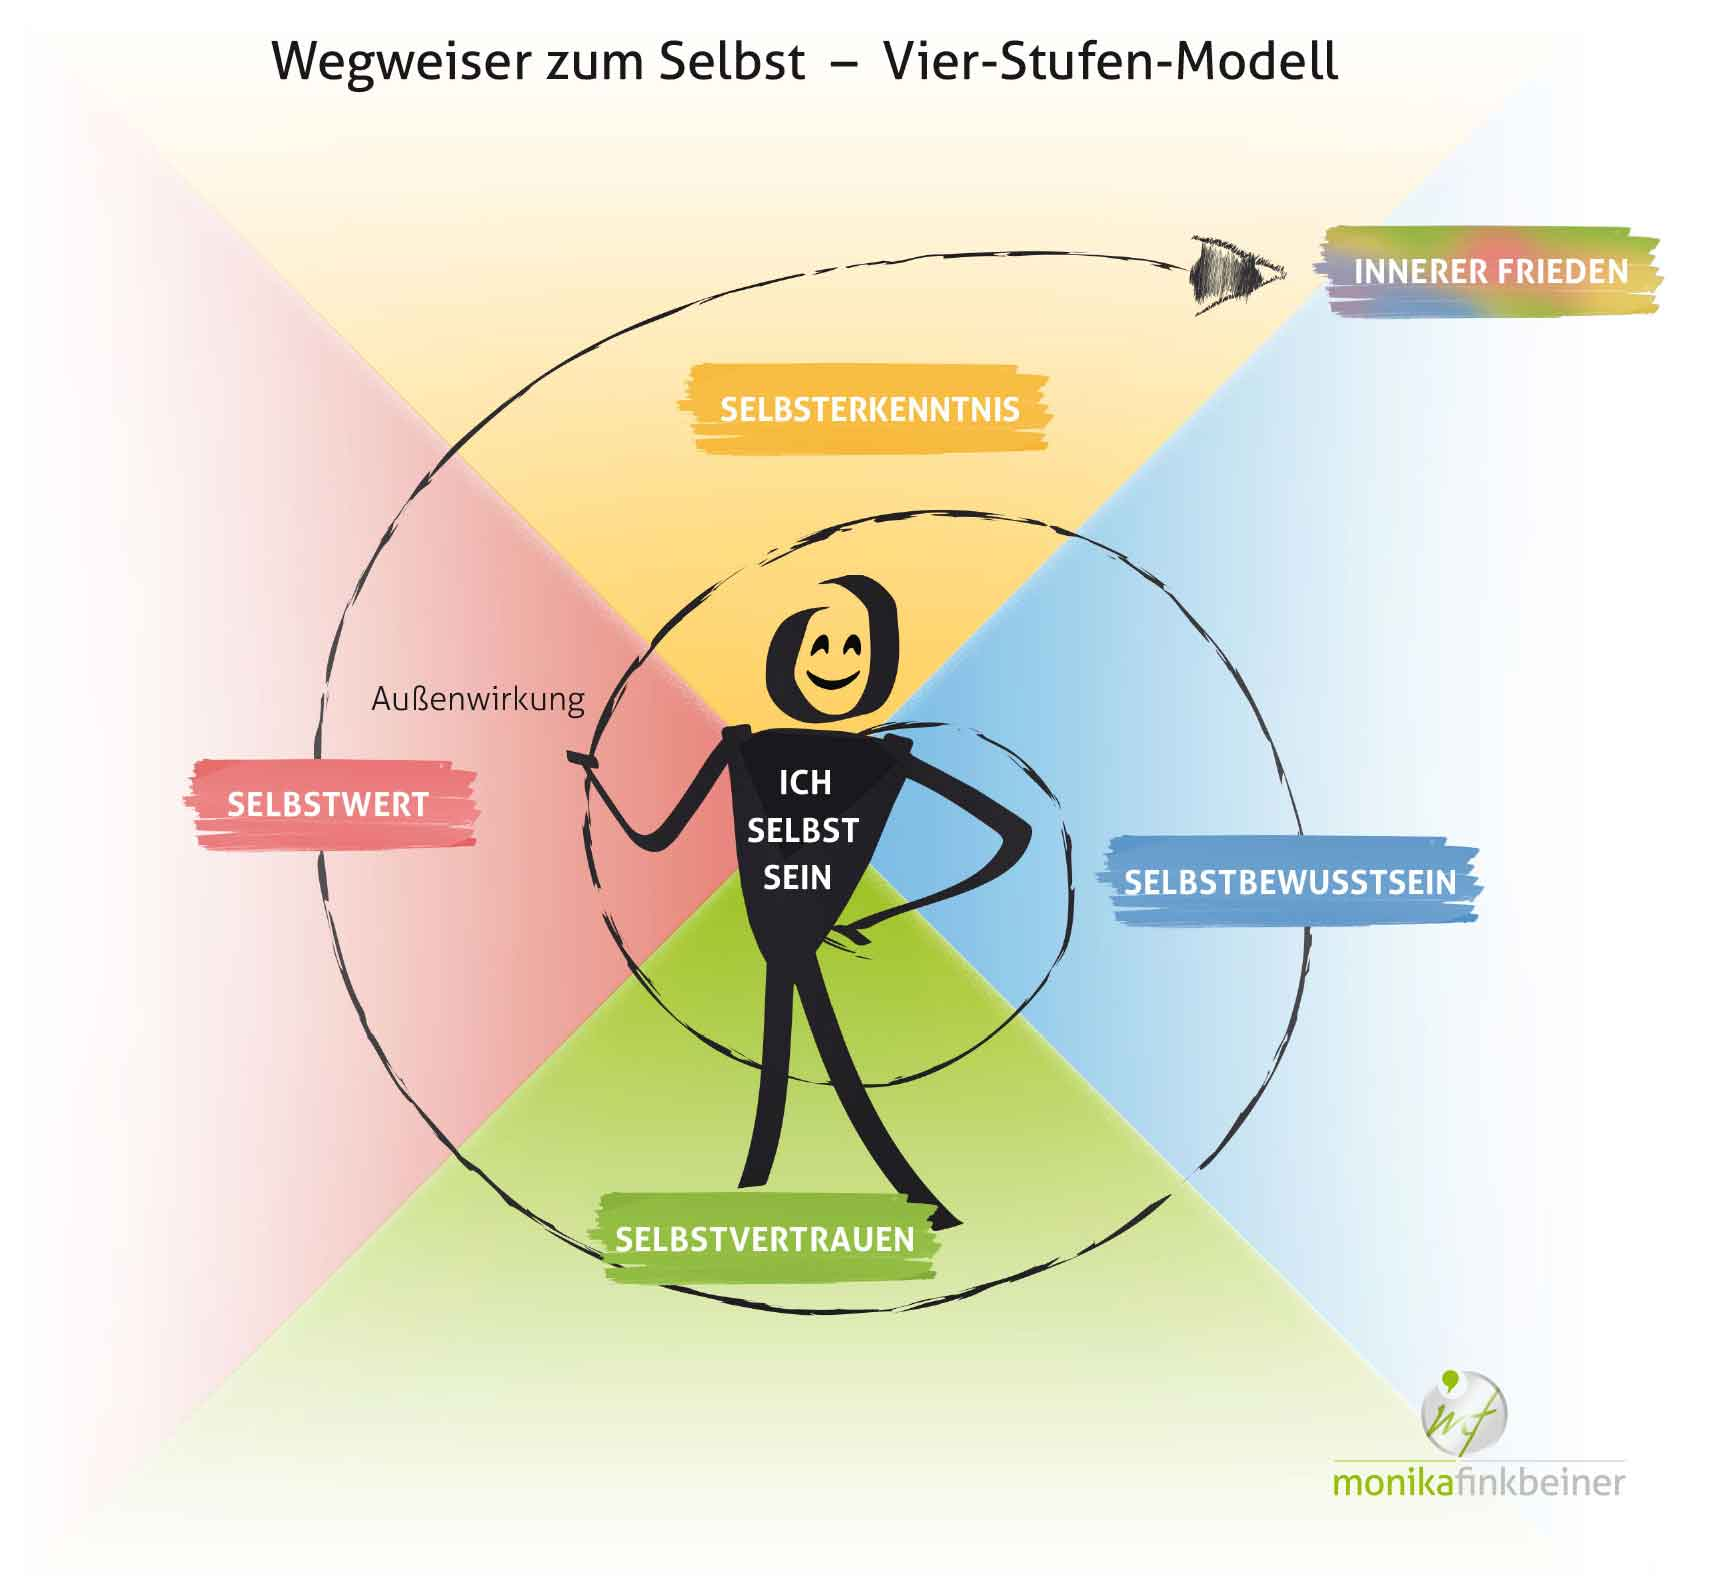 Vier_Stufen_Modell_web